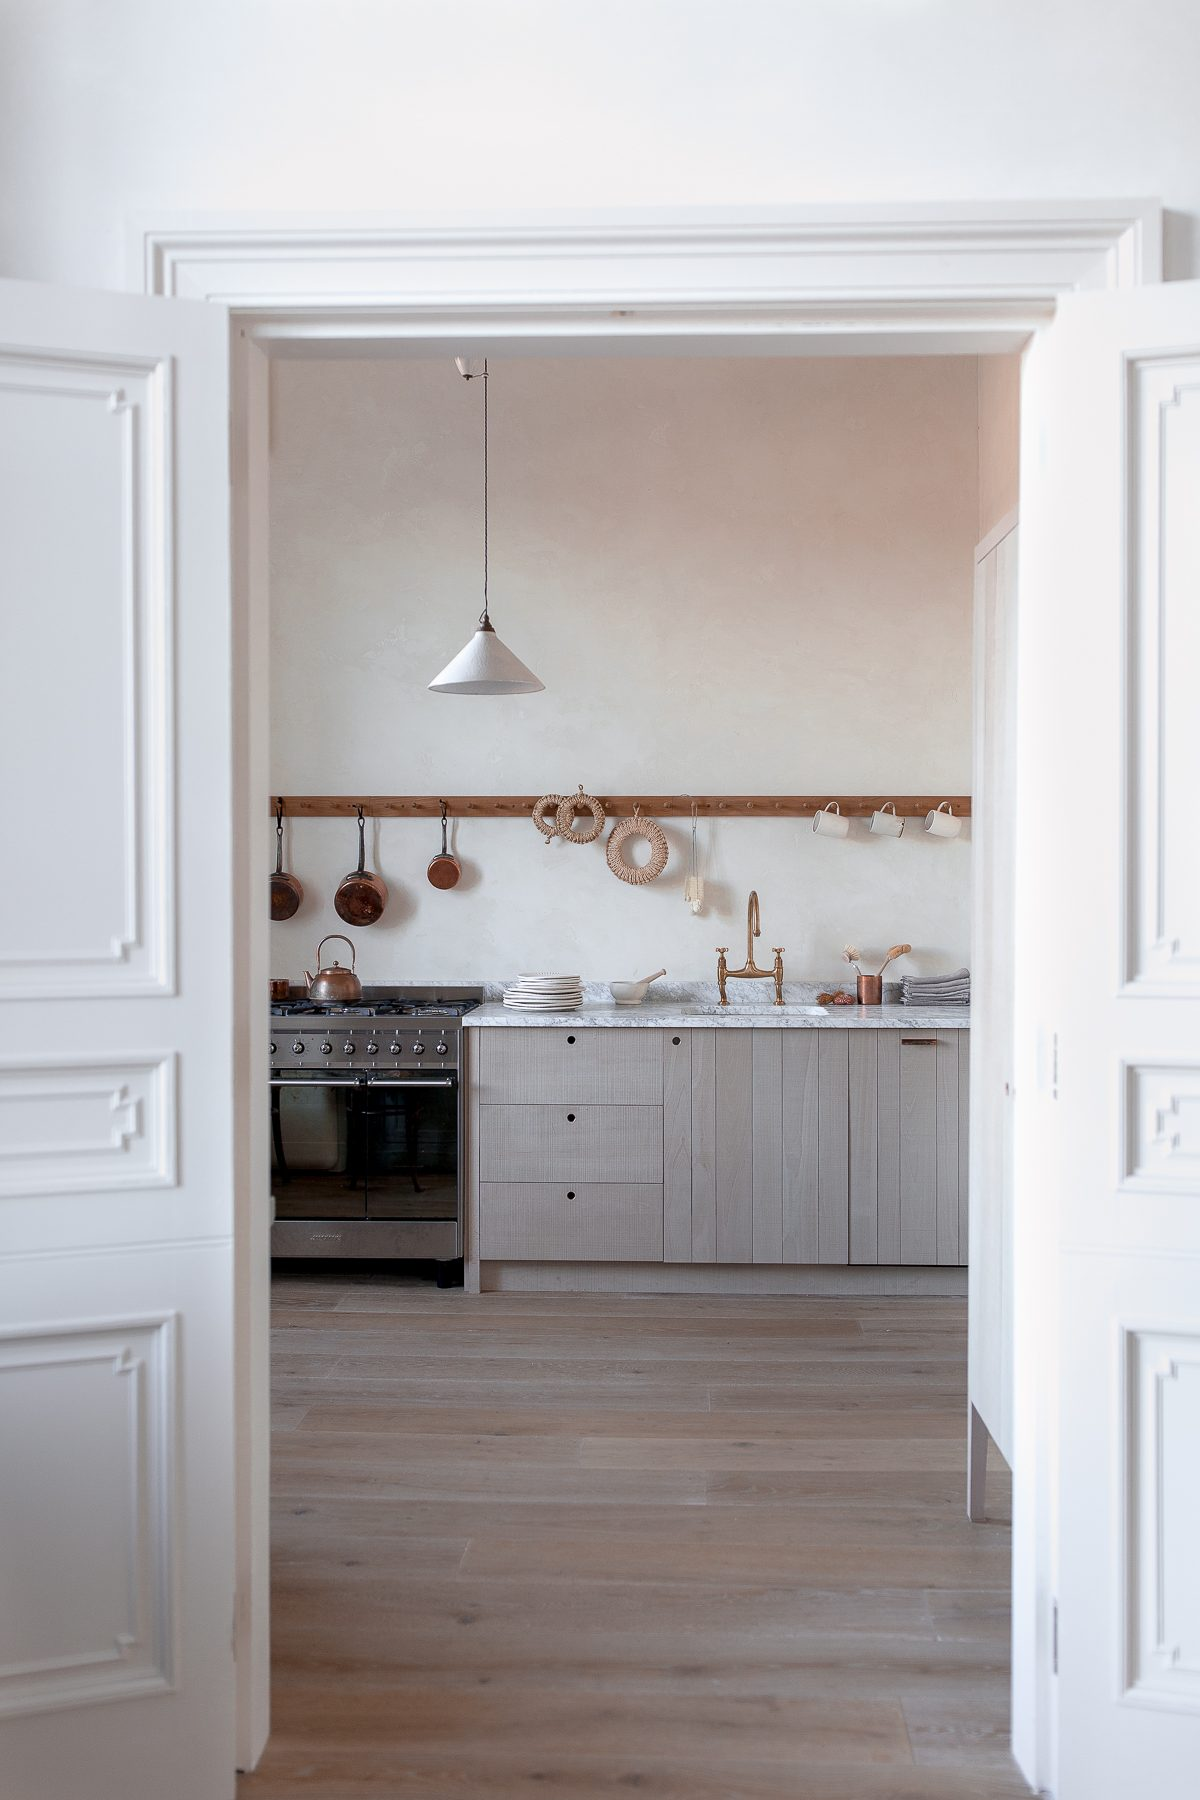 The Sebastian Cox Kitchen by deVOL - Ingredients LDN